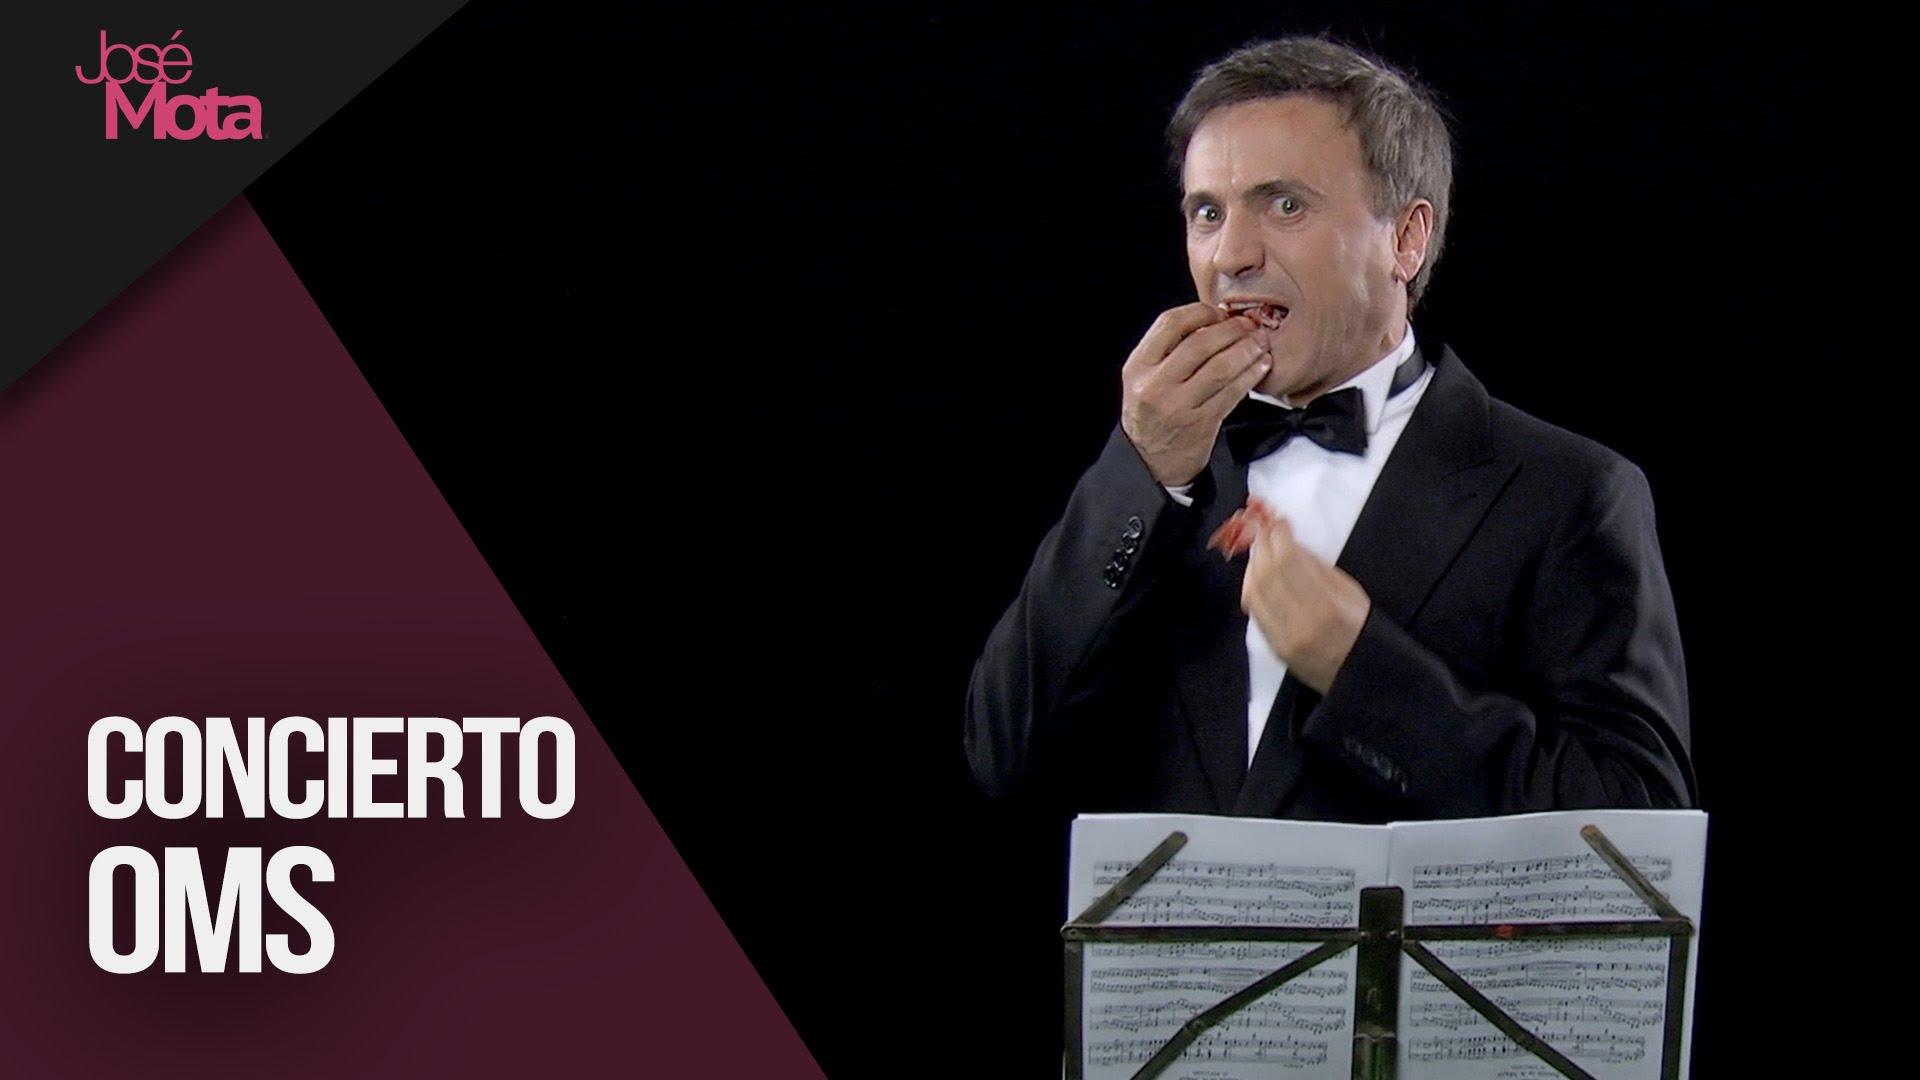 José Mota: Concierto de la OMS: Jamón Jamón